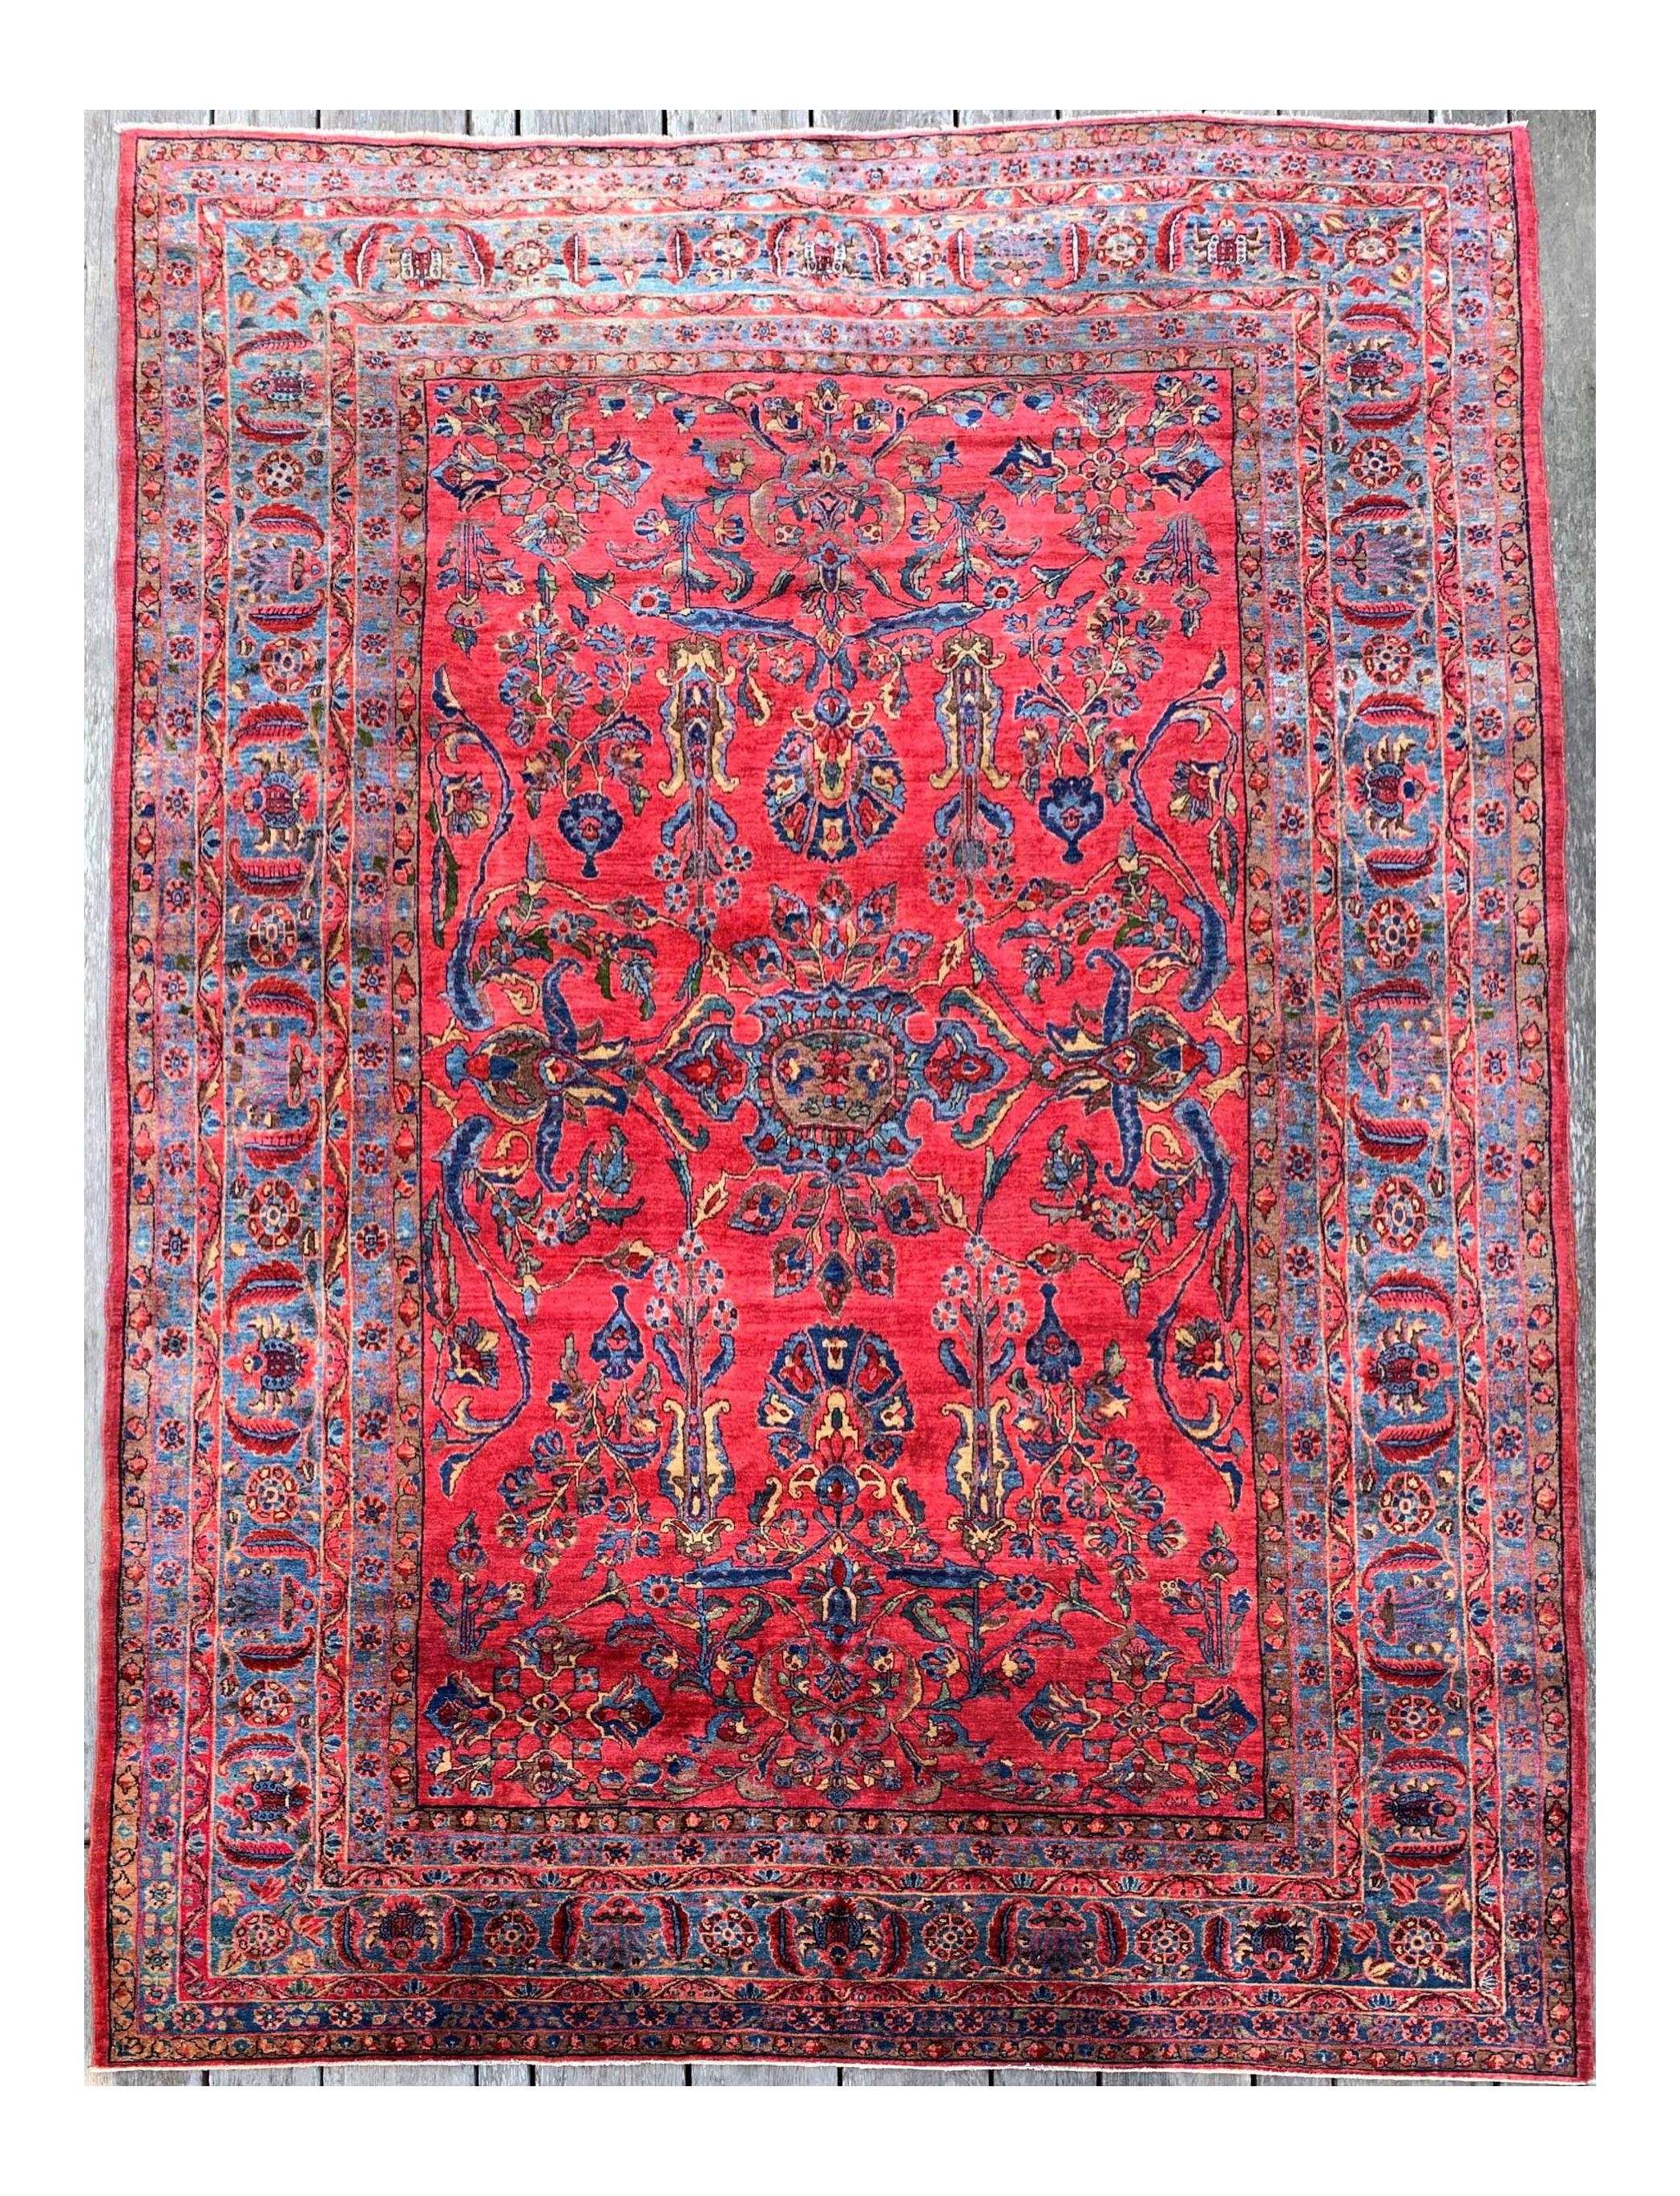 1920s Antique Persian Sarouk Rug 9 3 11 4 Rugs Persian Carpet Patterned Carpet